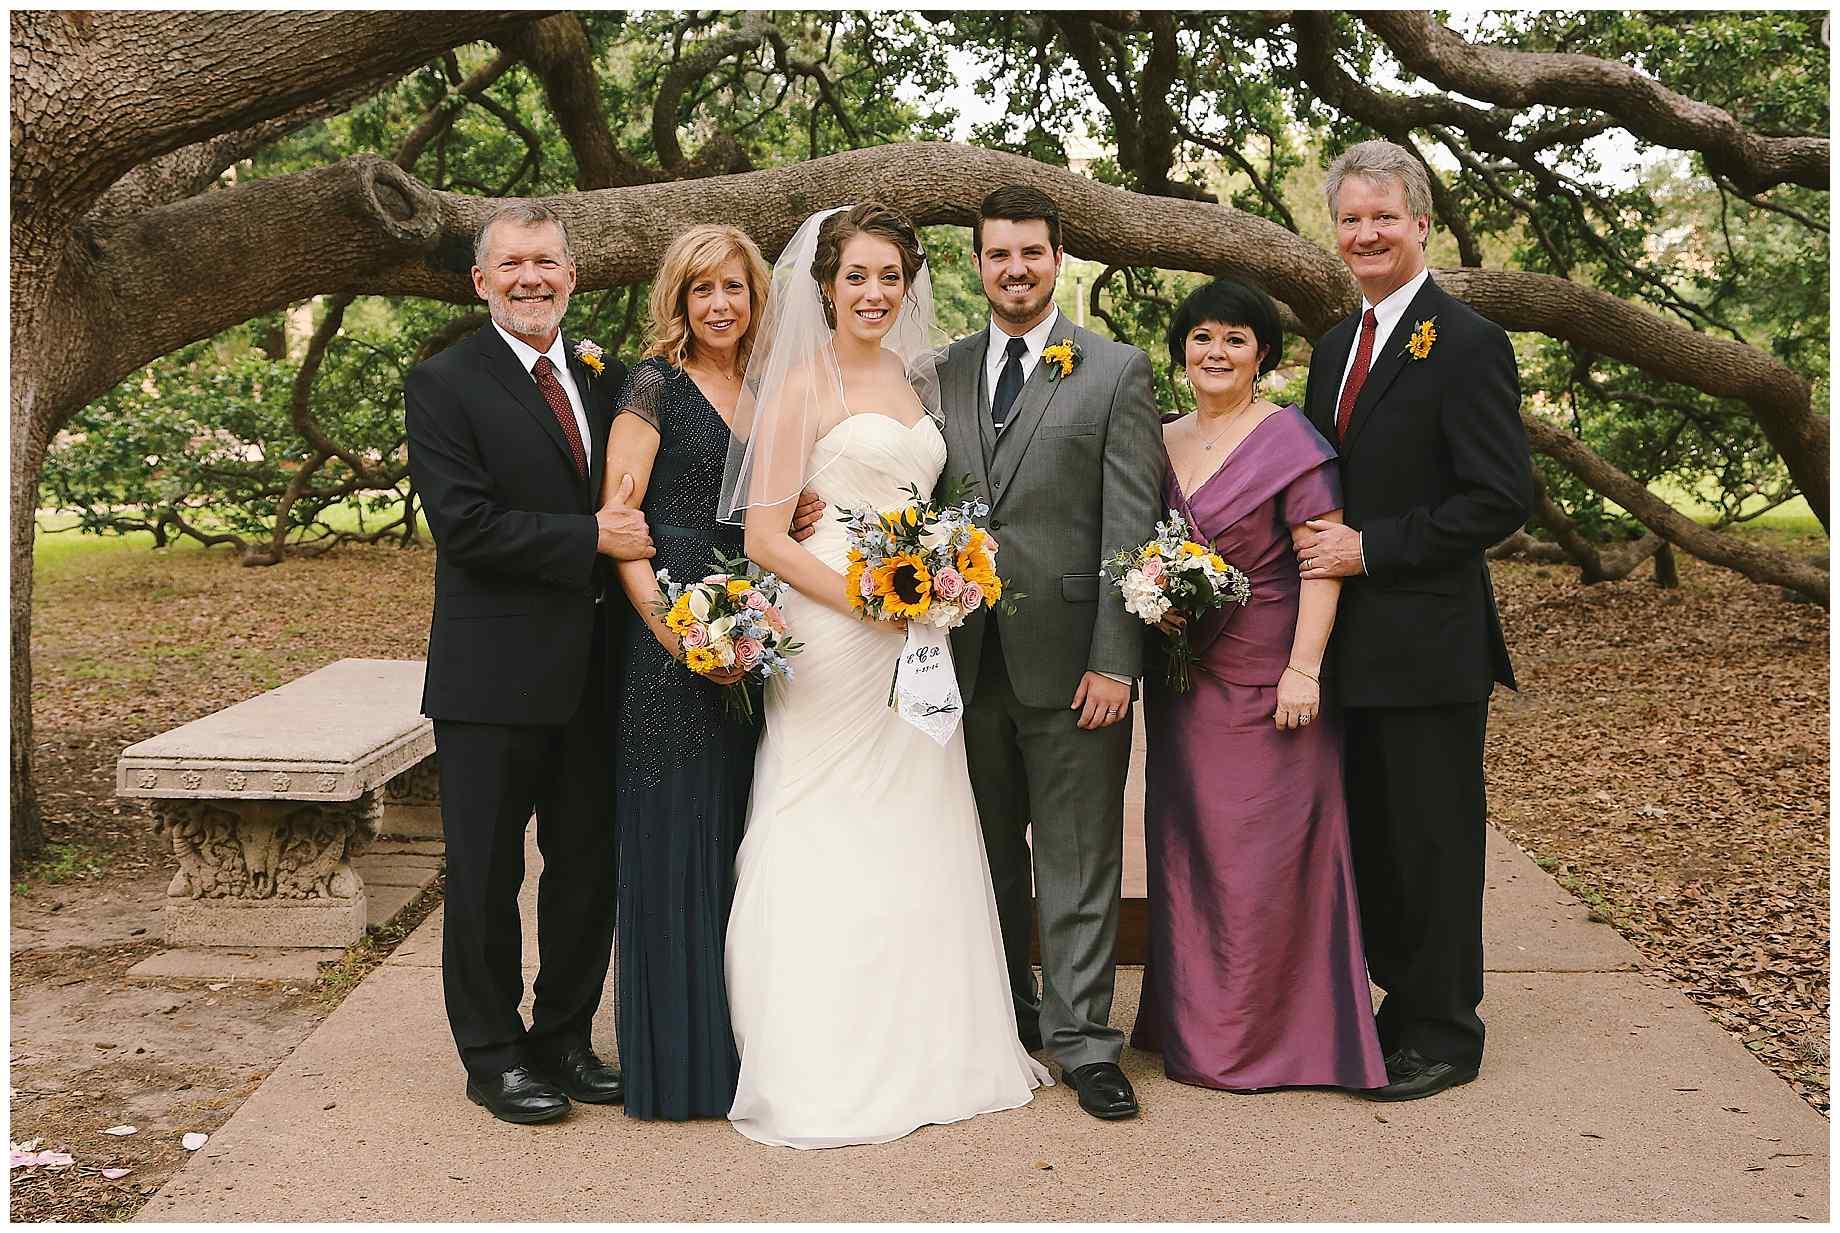 aggie-century-tree-wedding-19